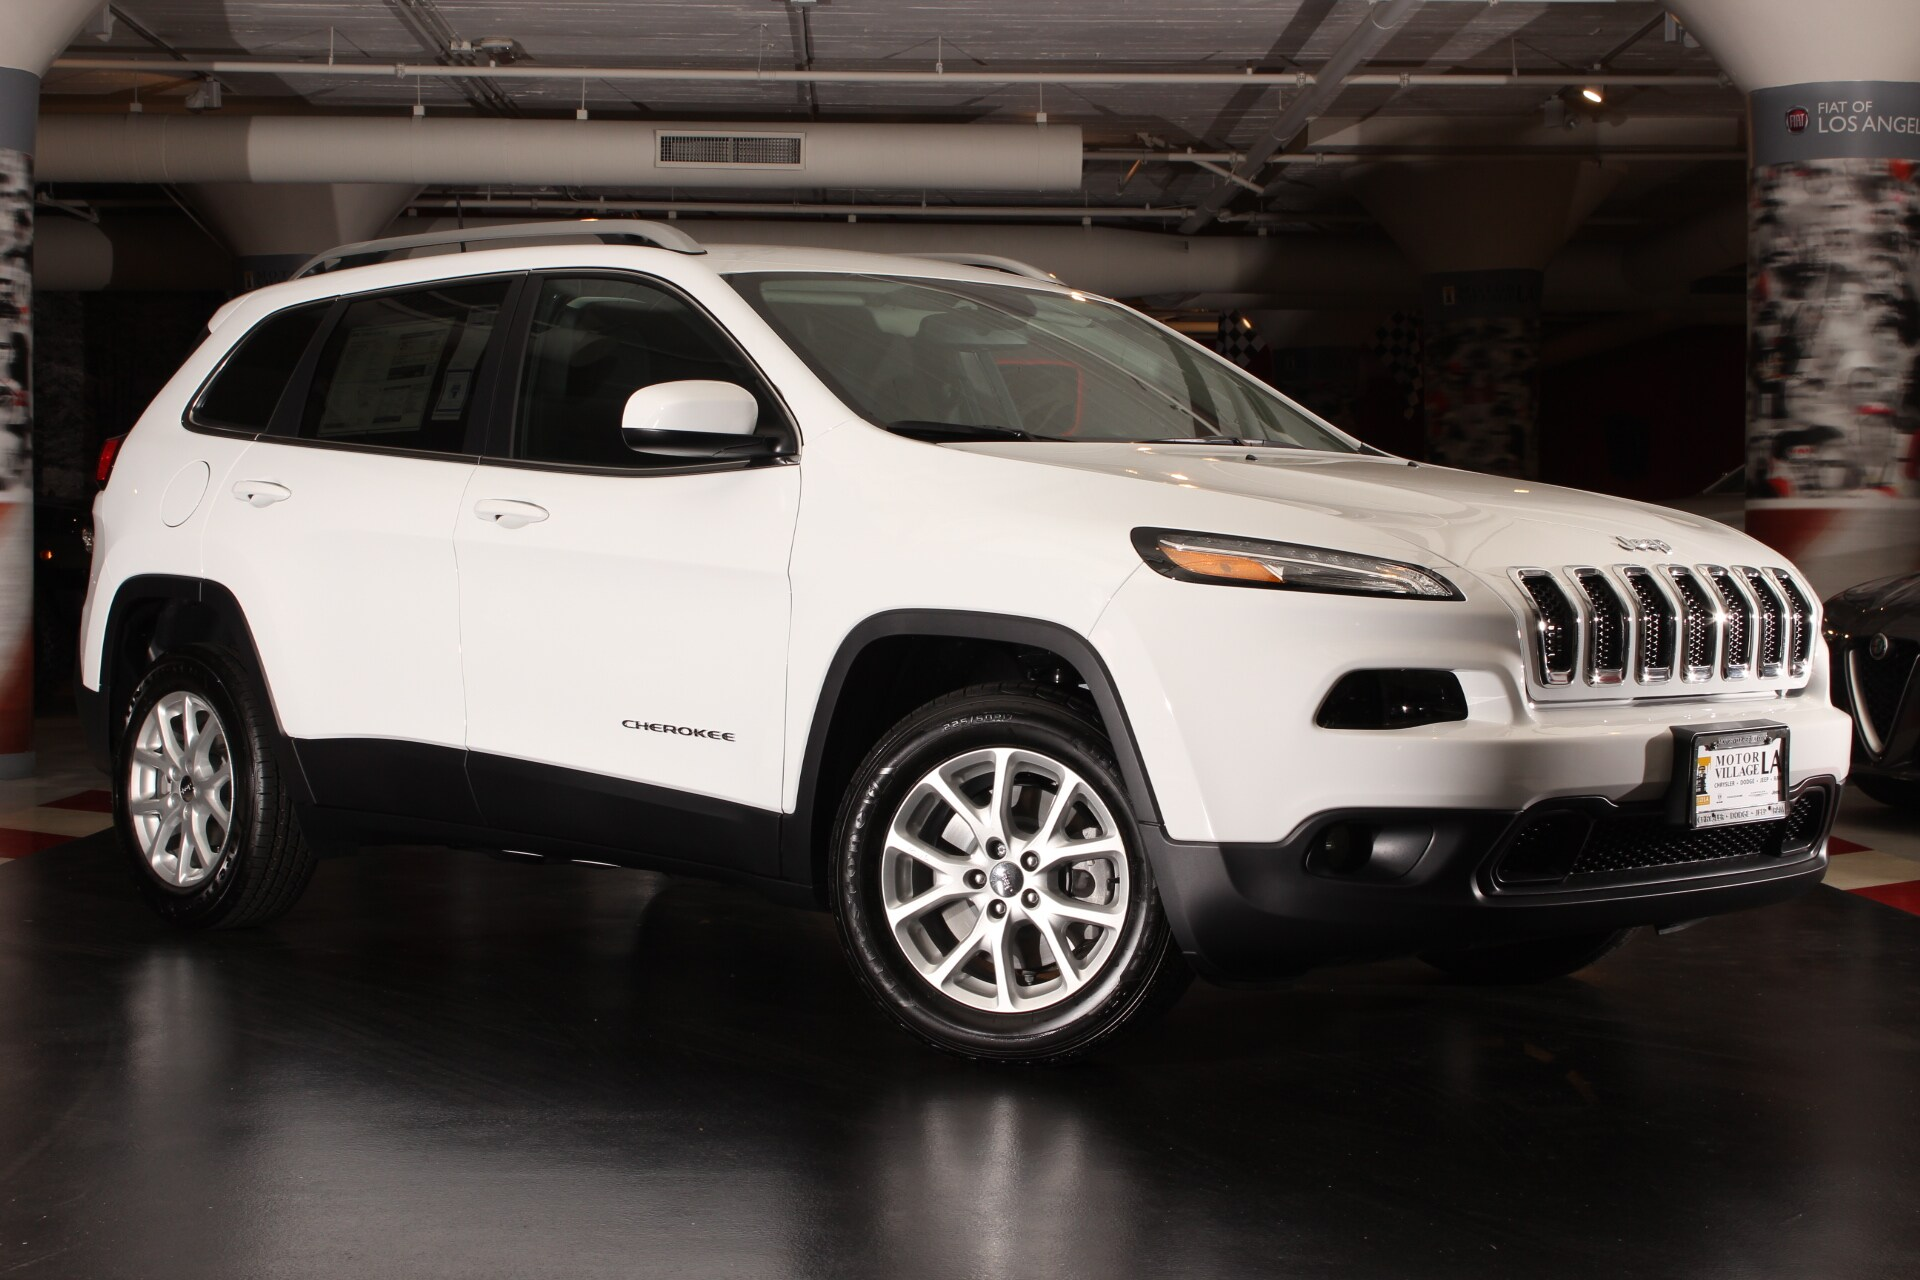 2017 Jeep Cherokee Latitude FWD  1-Year SIRIUSXM Radio Service 6 Month Trial 600 Amp Maintenanc